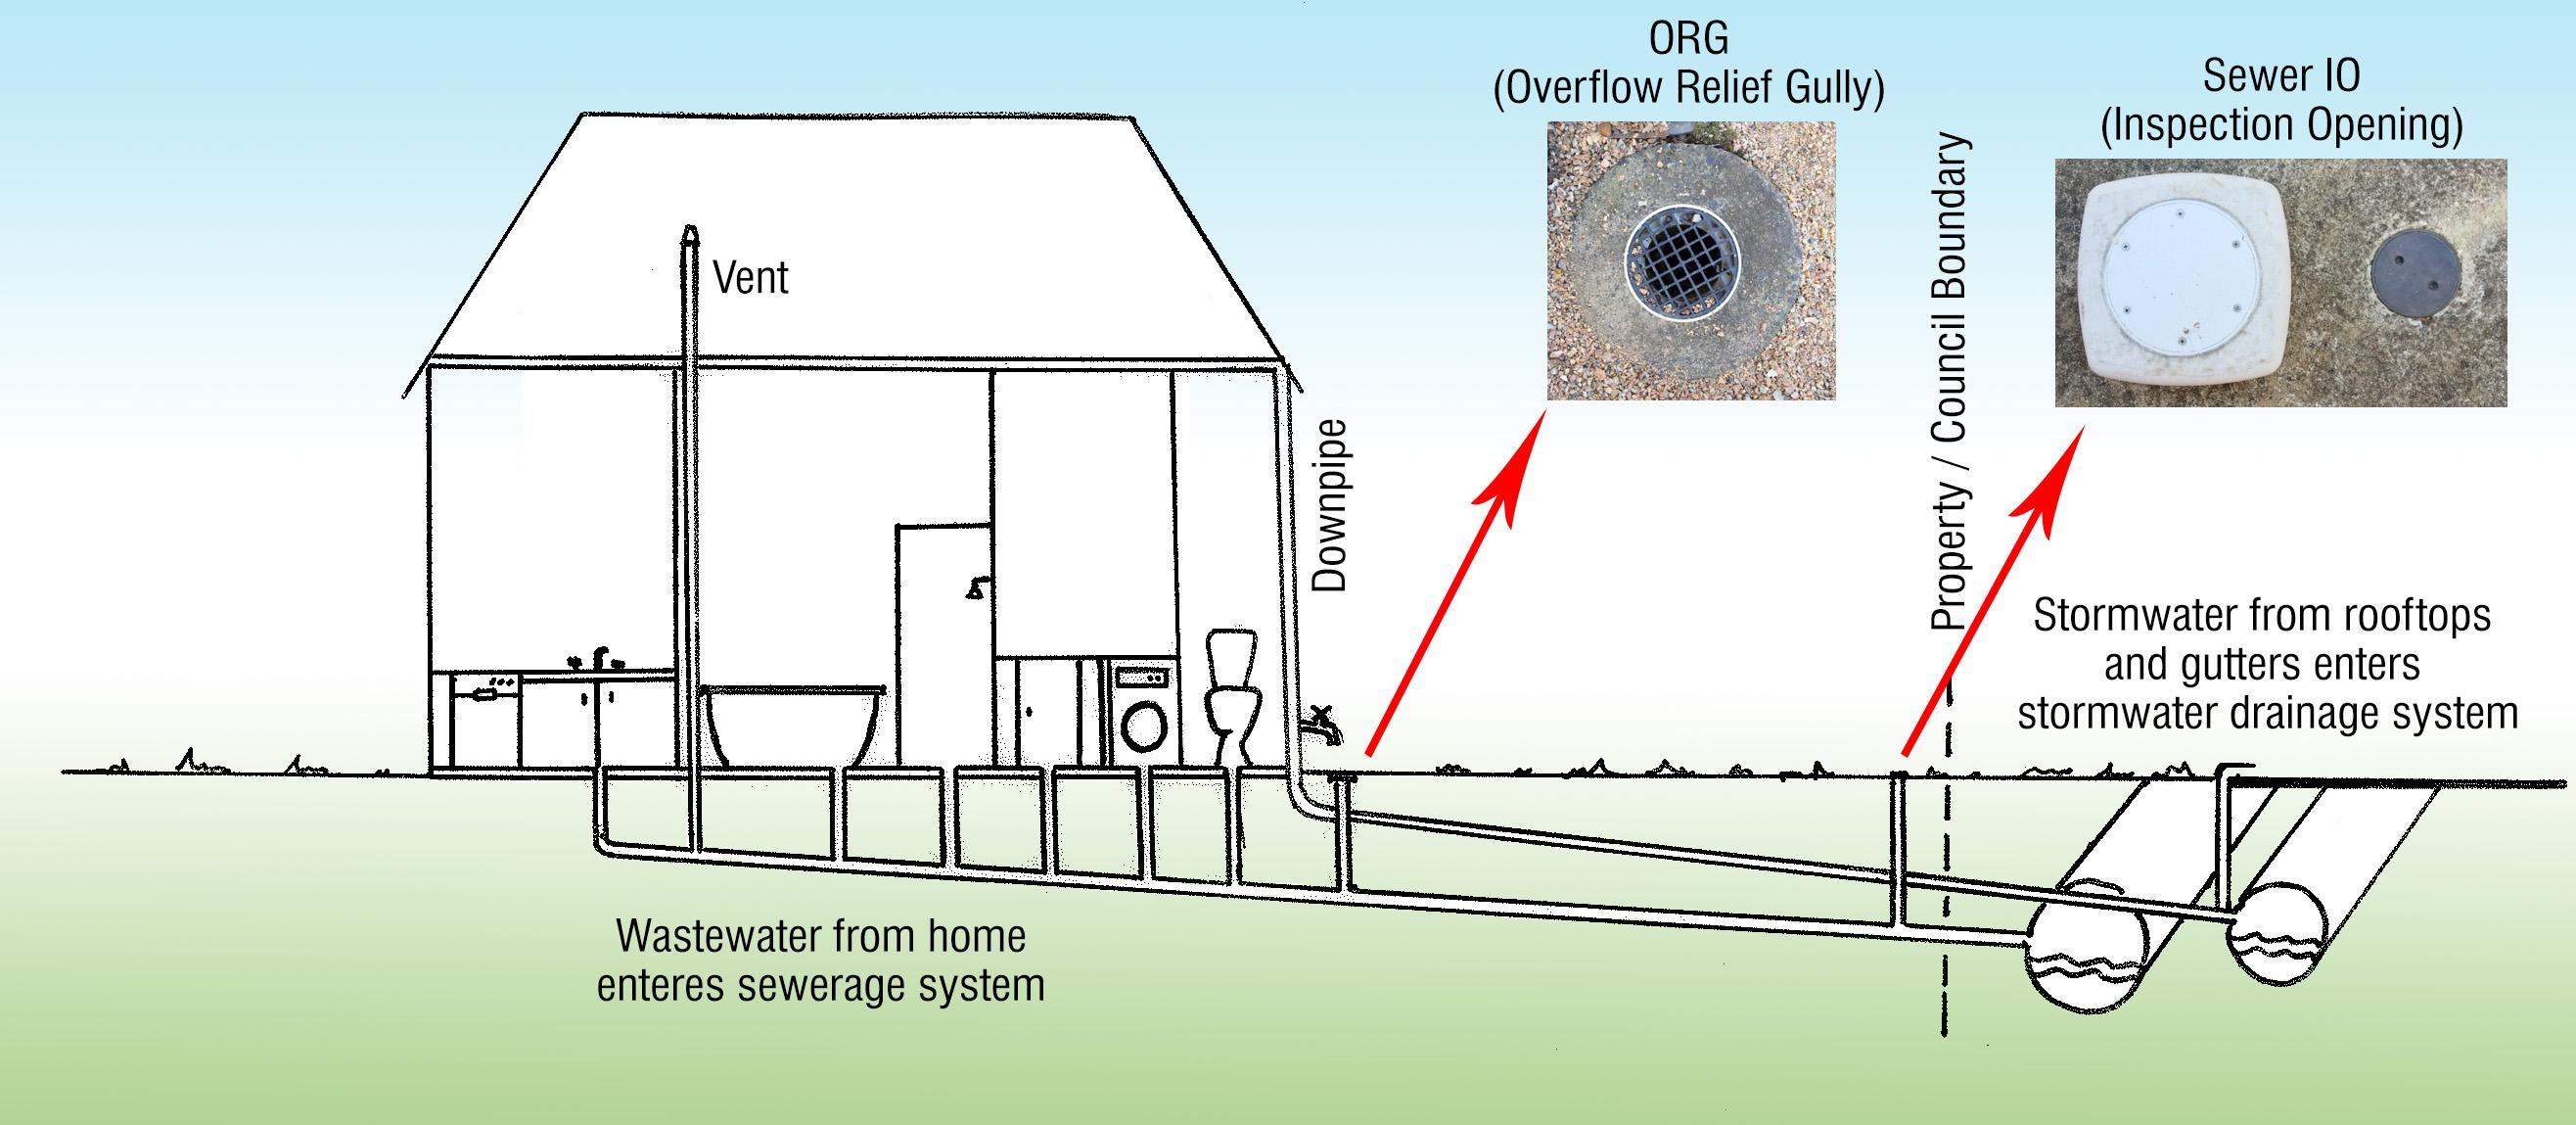 House drain diagram home sewer diagram elsavadorla for Sewer diagram for house